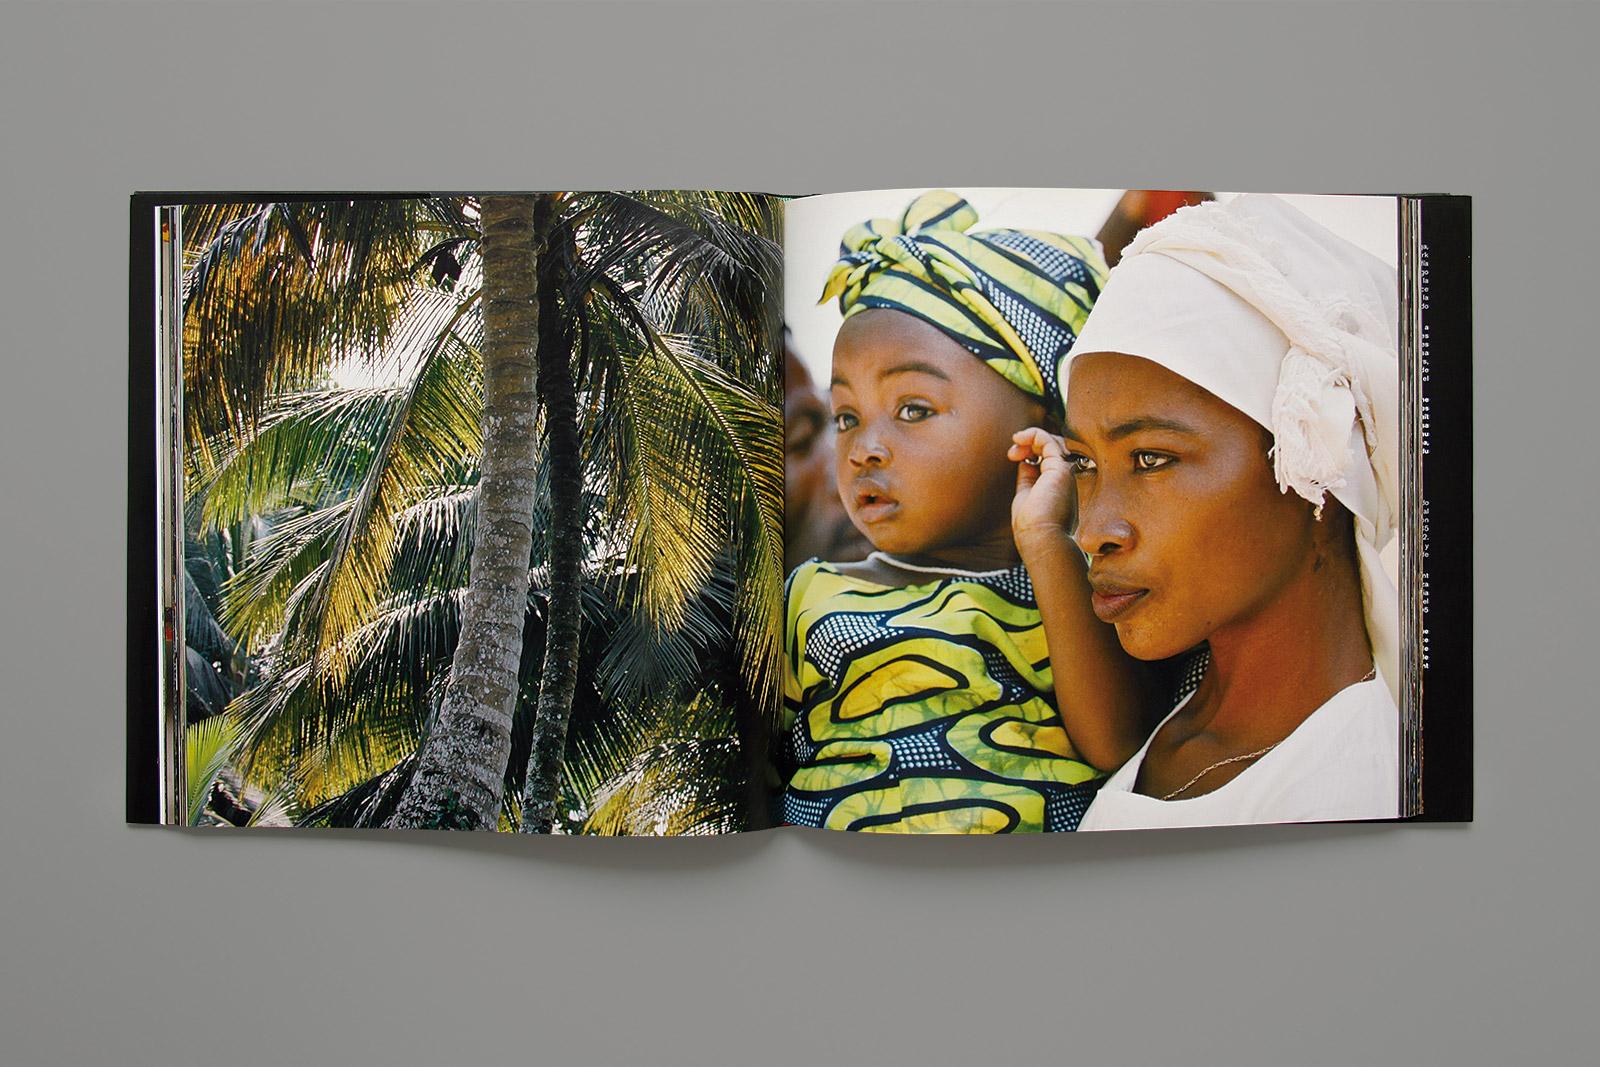 camerun doble page